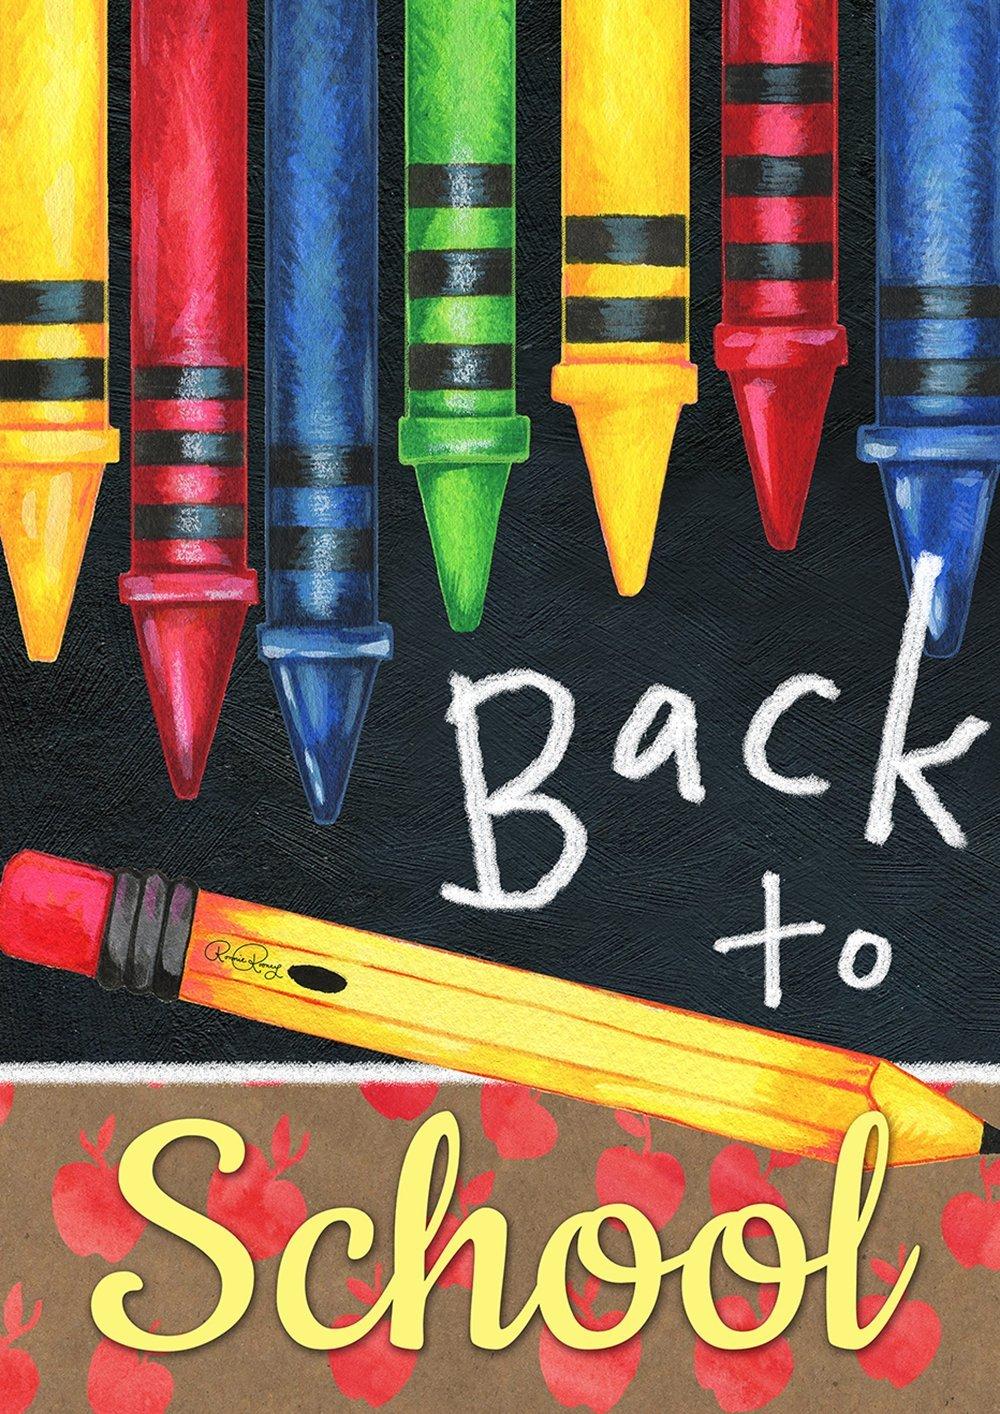 Toland Home Garden 1012196 Decorative Fall Autumn Back to School Crayons Supplies House Flag, 28 x 40, Multicolor